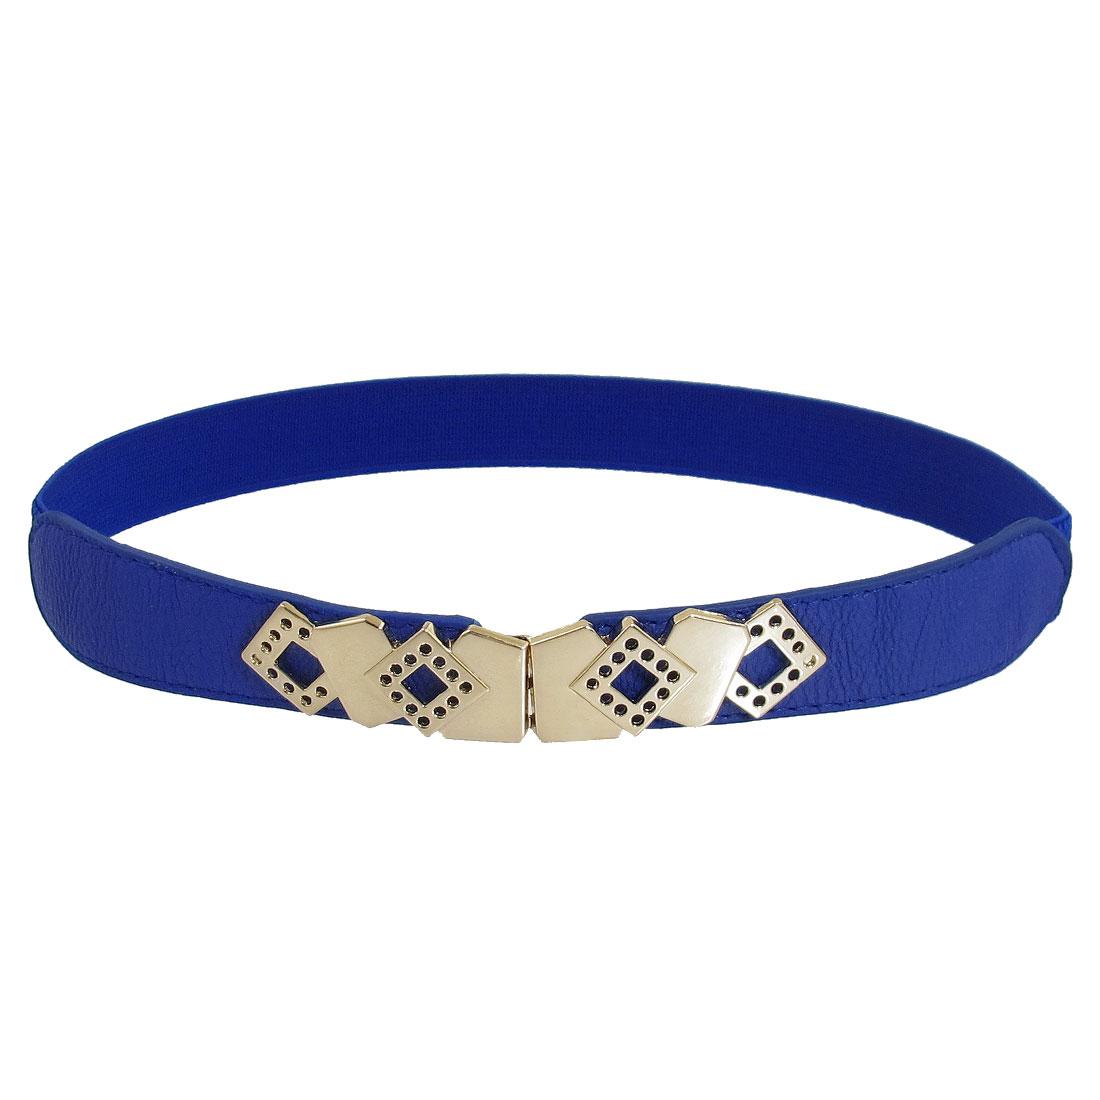 Woman Rhombus Metal Interlocking Buckle Slim Cinch Belt Stretchy Waistband Blue